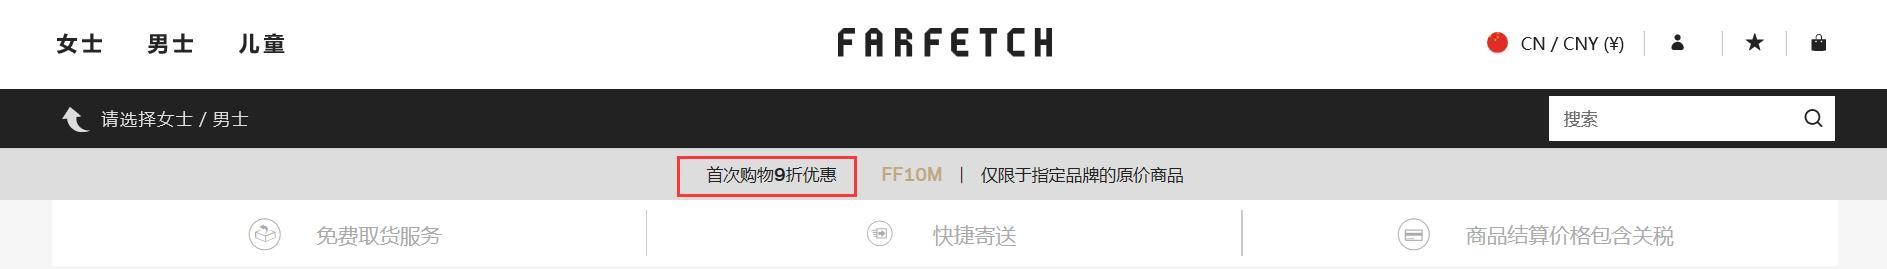 farfetch2.png